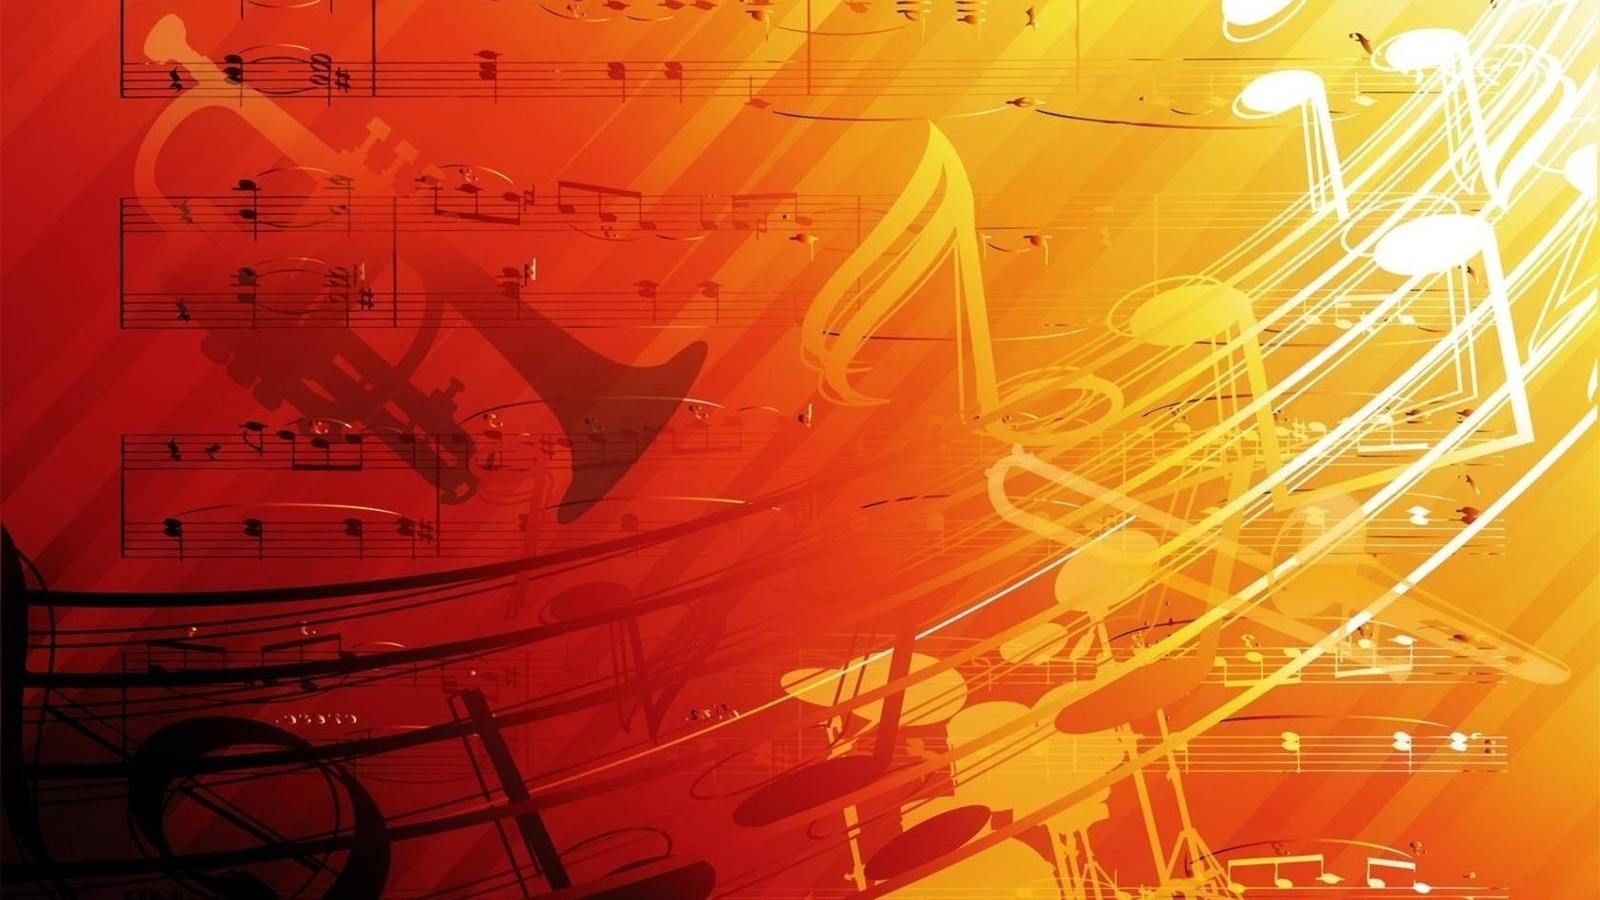 Wallpapers Hd 3d Music: 3D Music Wallpapers For Desktop